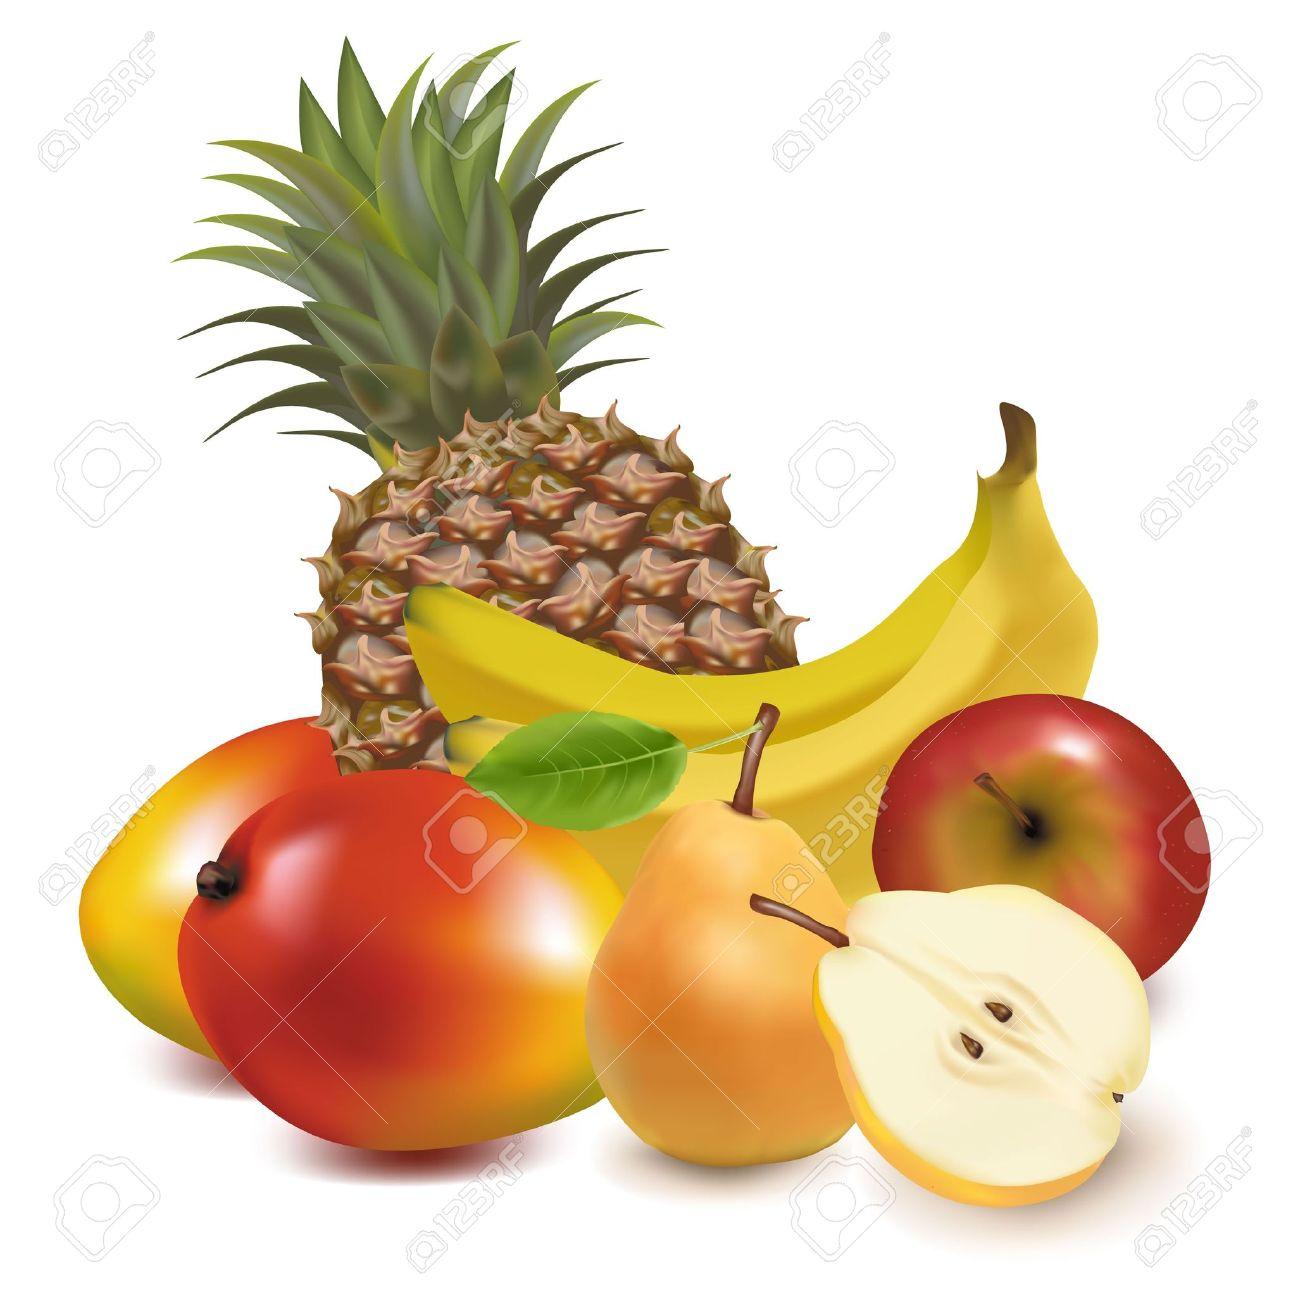 Tropical fruit clipart.